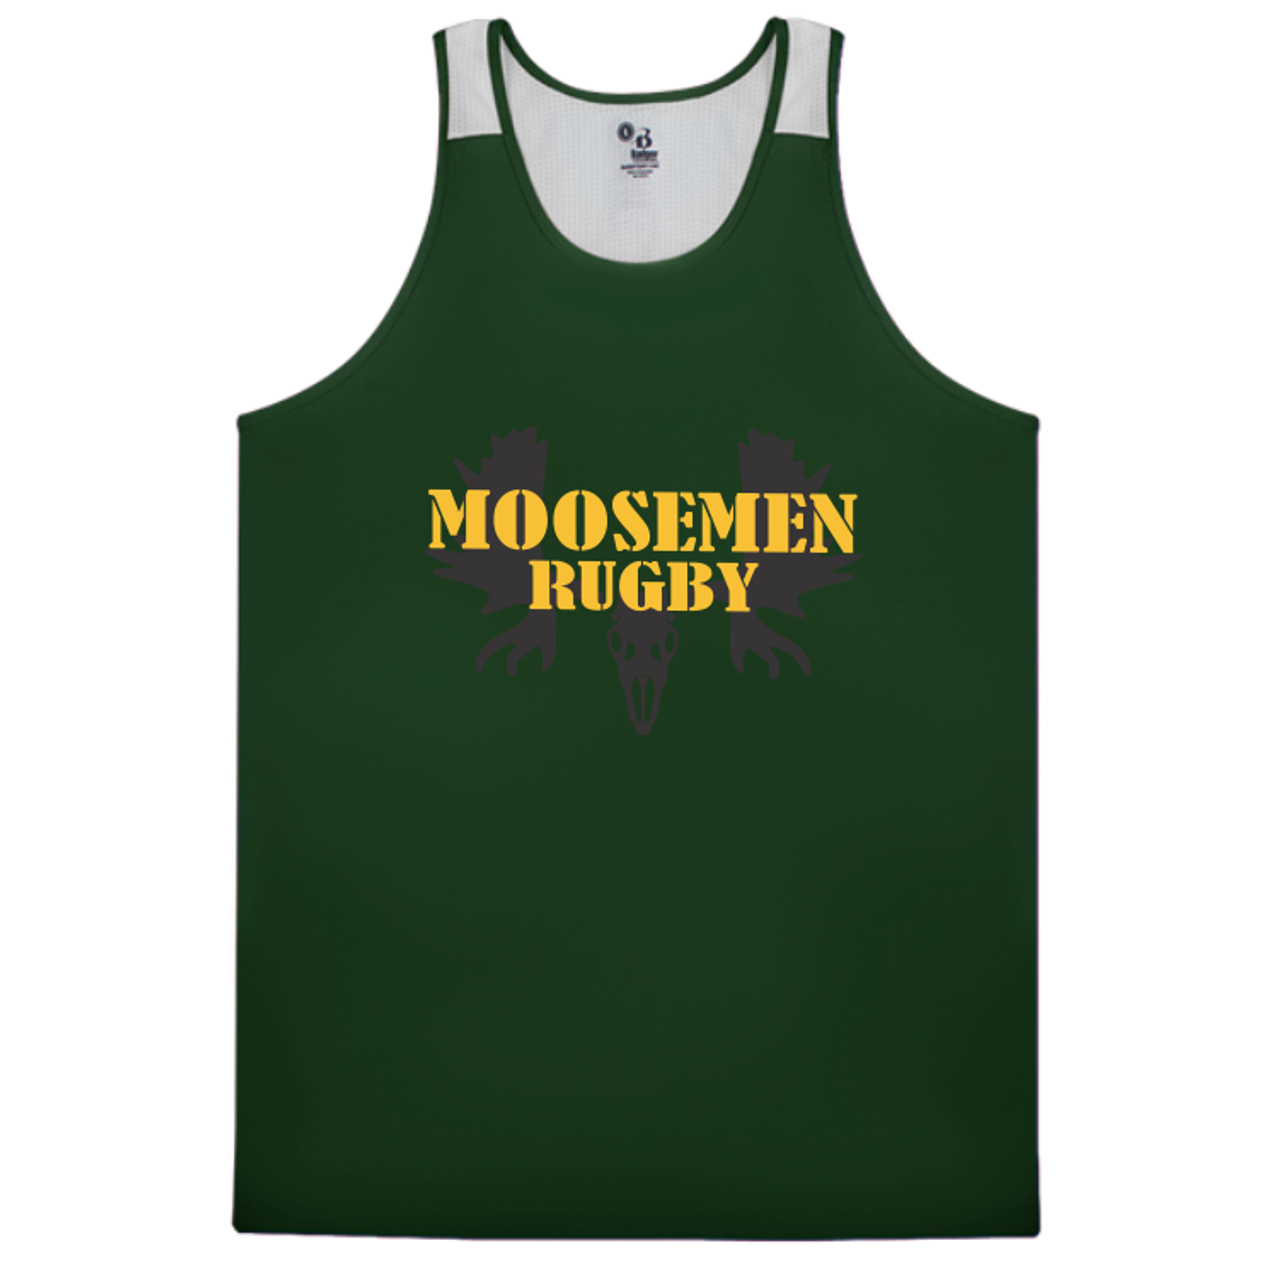 Moosemen Rugby Vent Back Tank